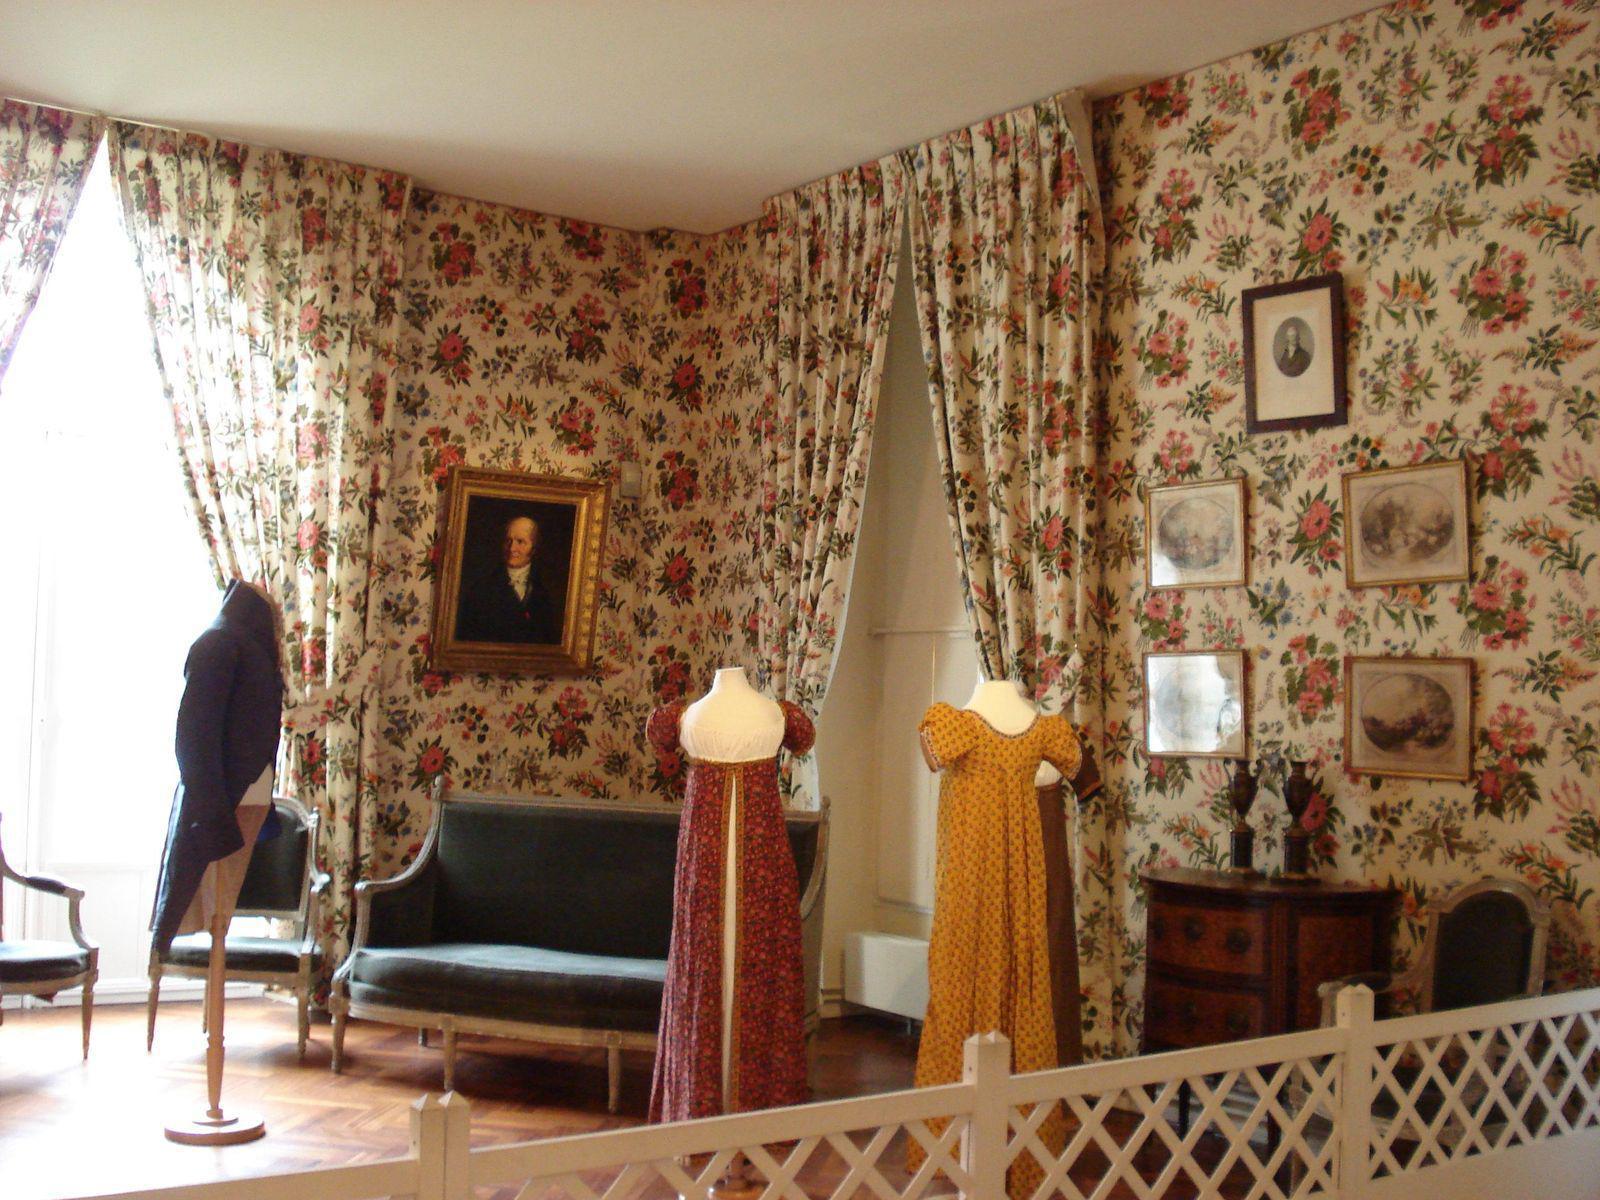 Musée de la ToÎle de Jouy_Jouy-en-Josas